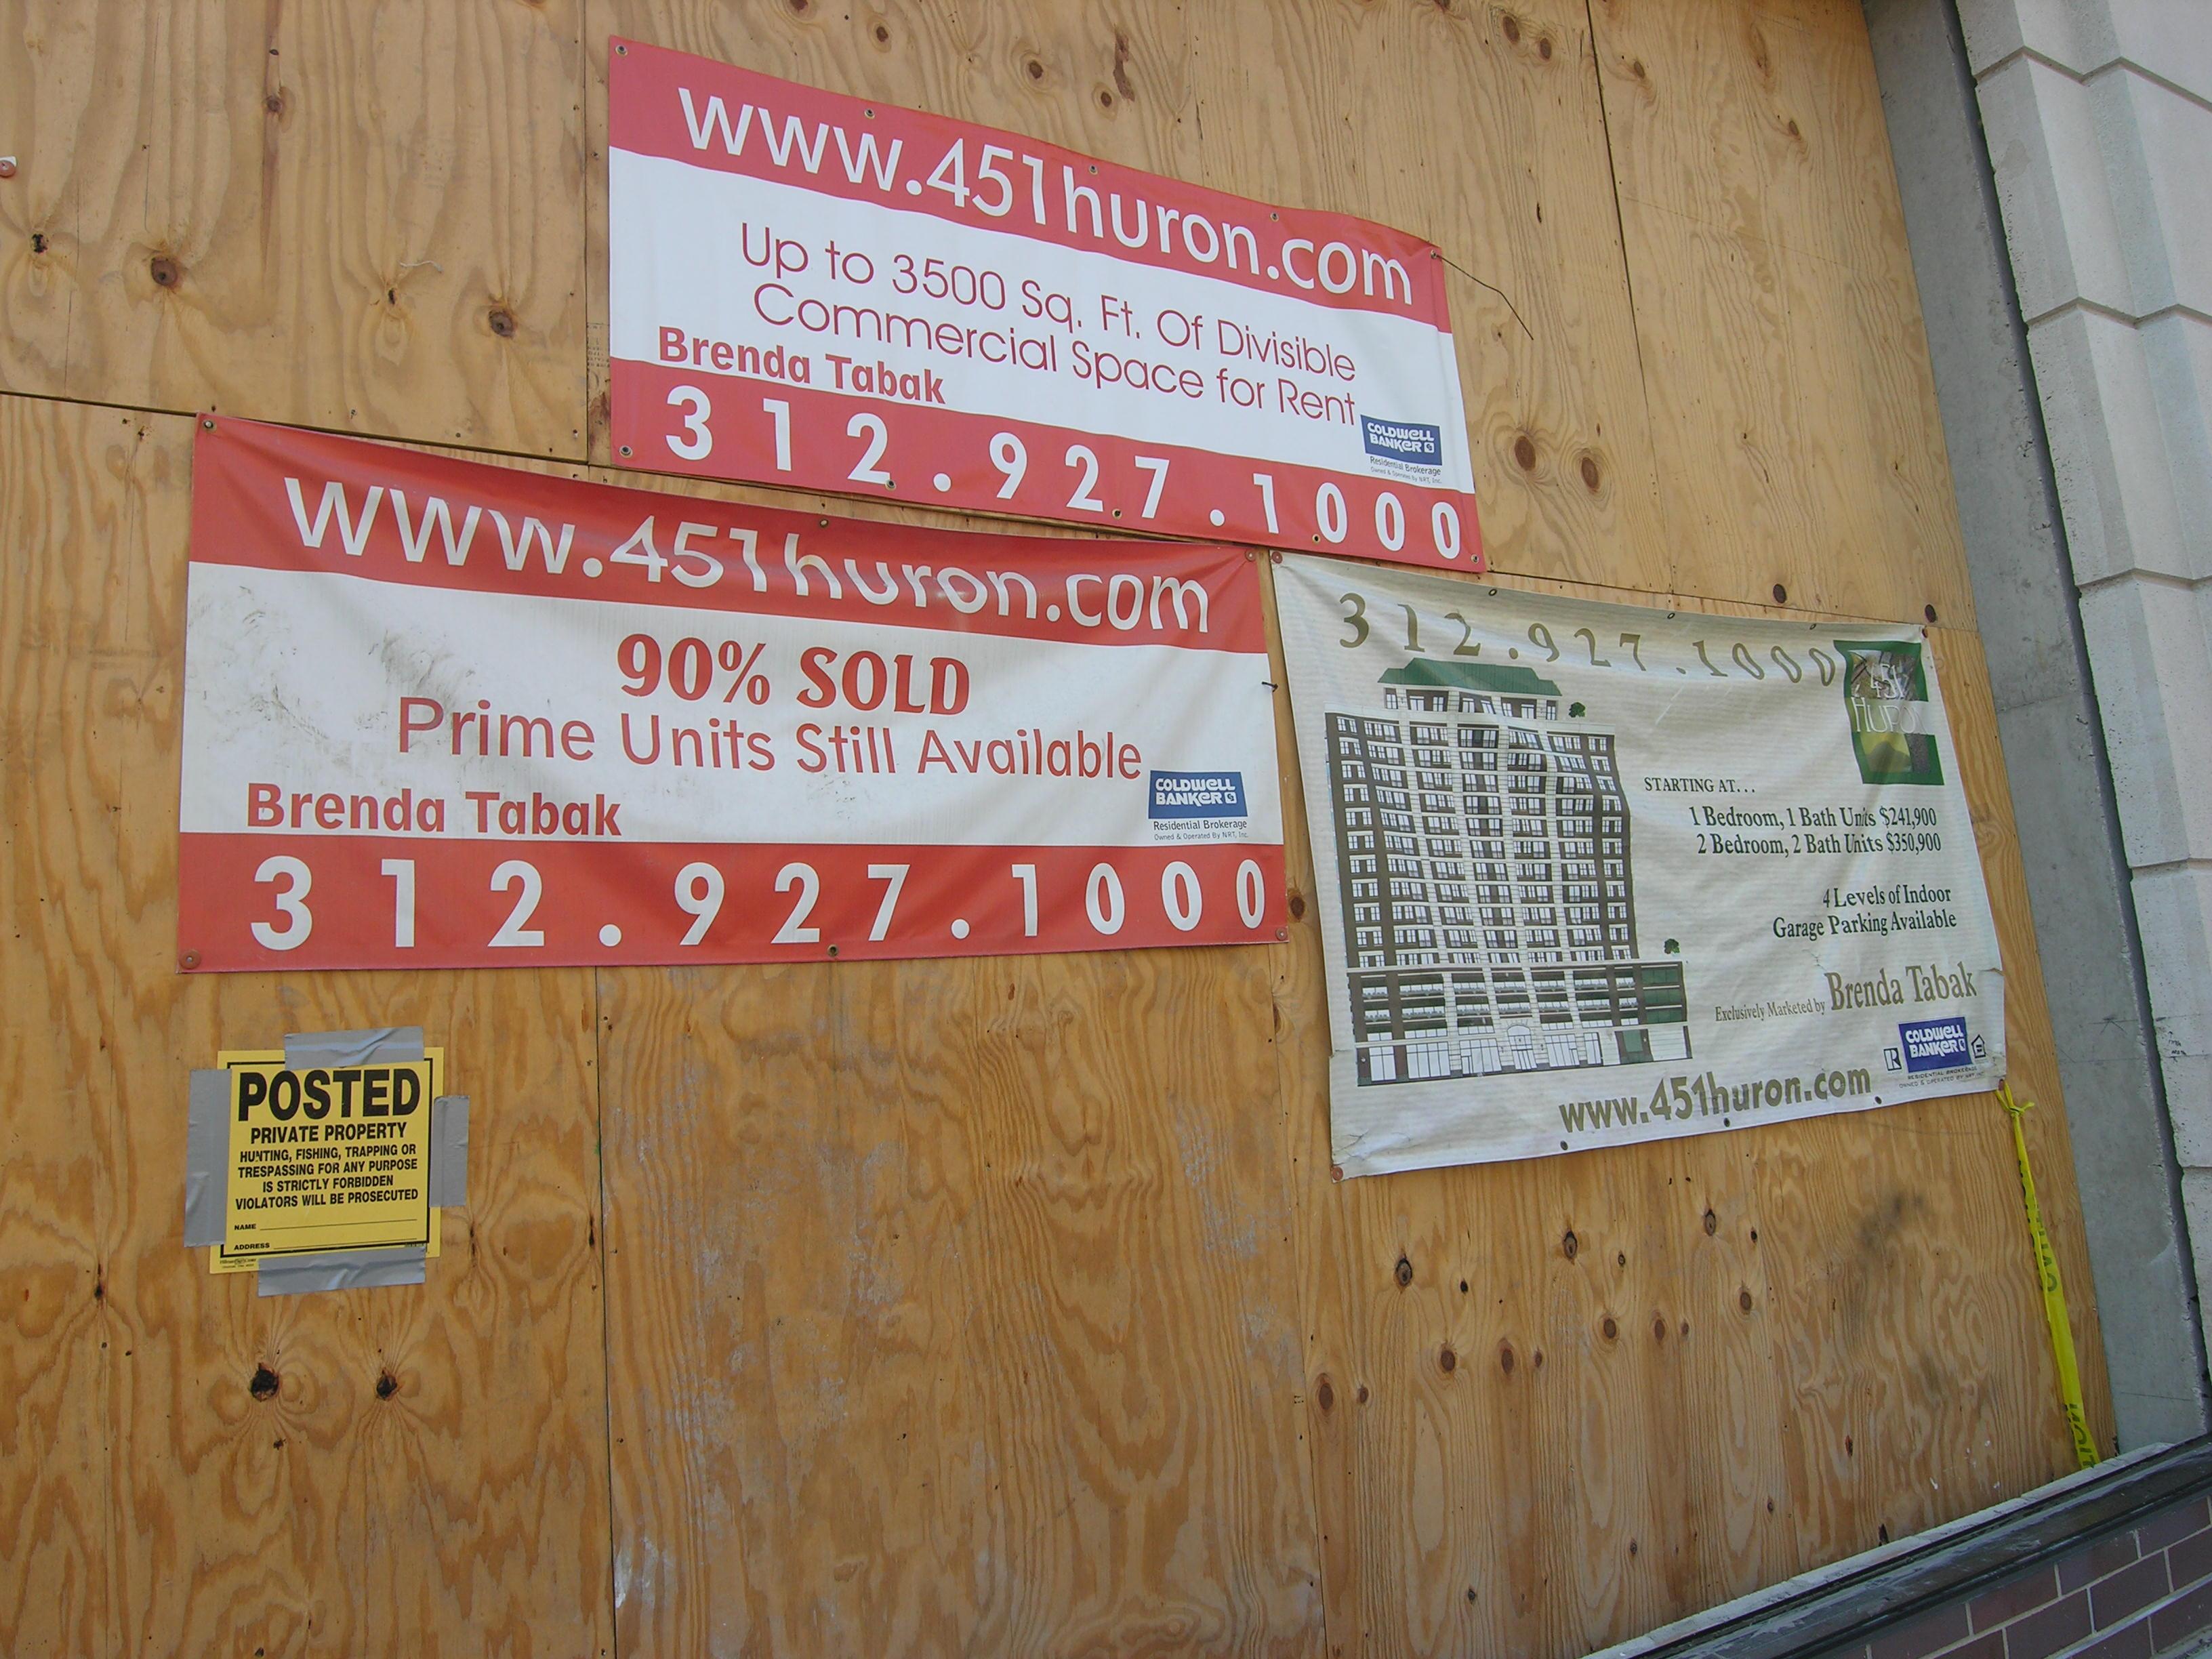 451 W Huron St sign